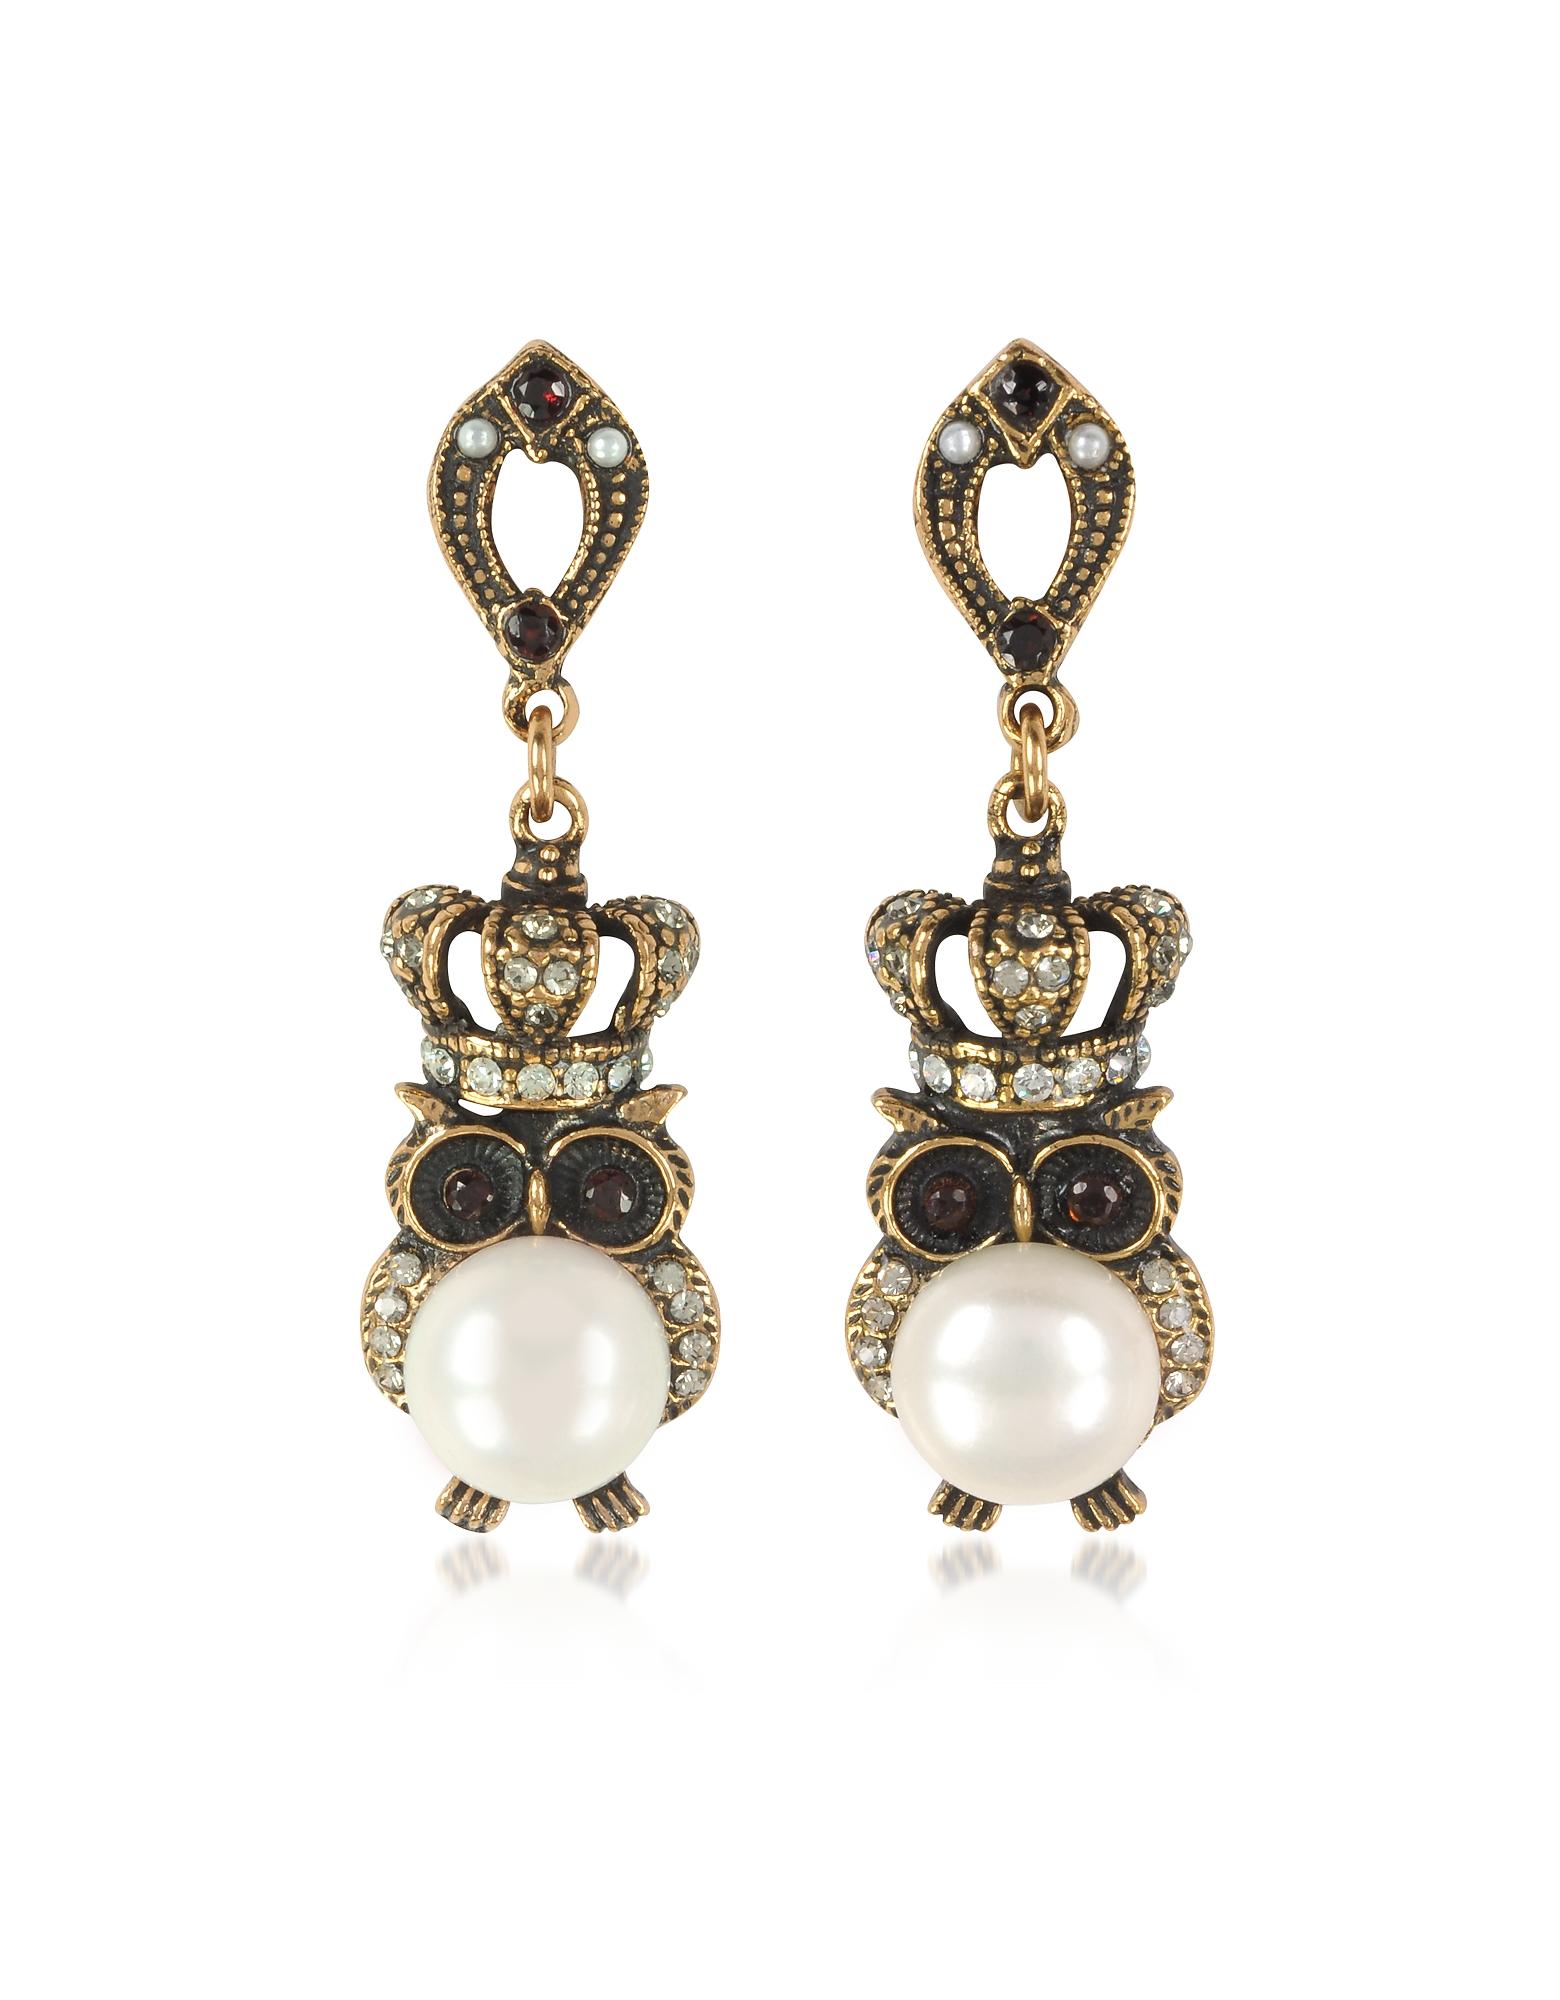 Forzieri coupon: Alcozer & J  Earrings Crowned Owl Earrings w/Pearls